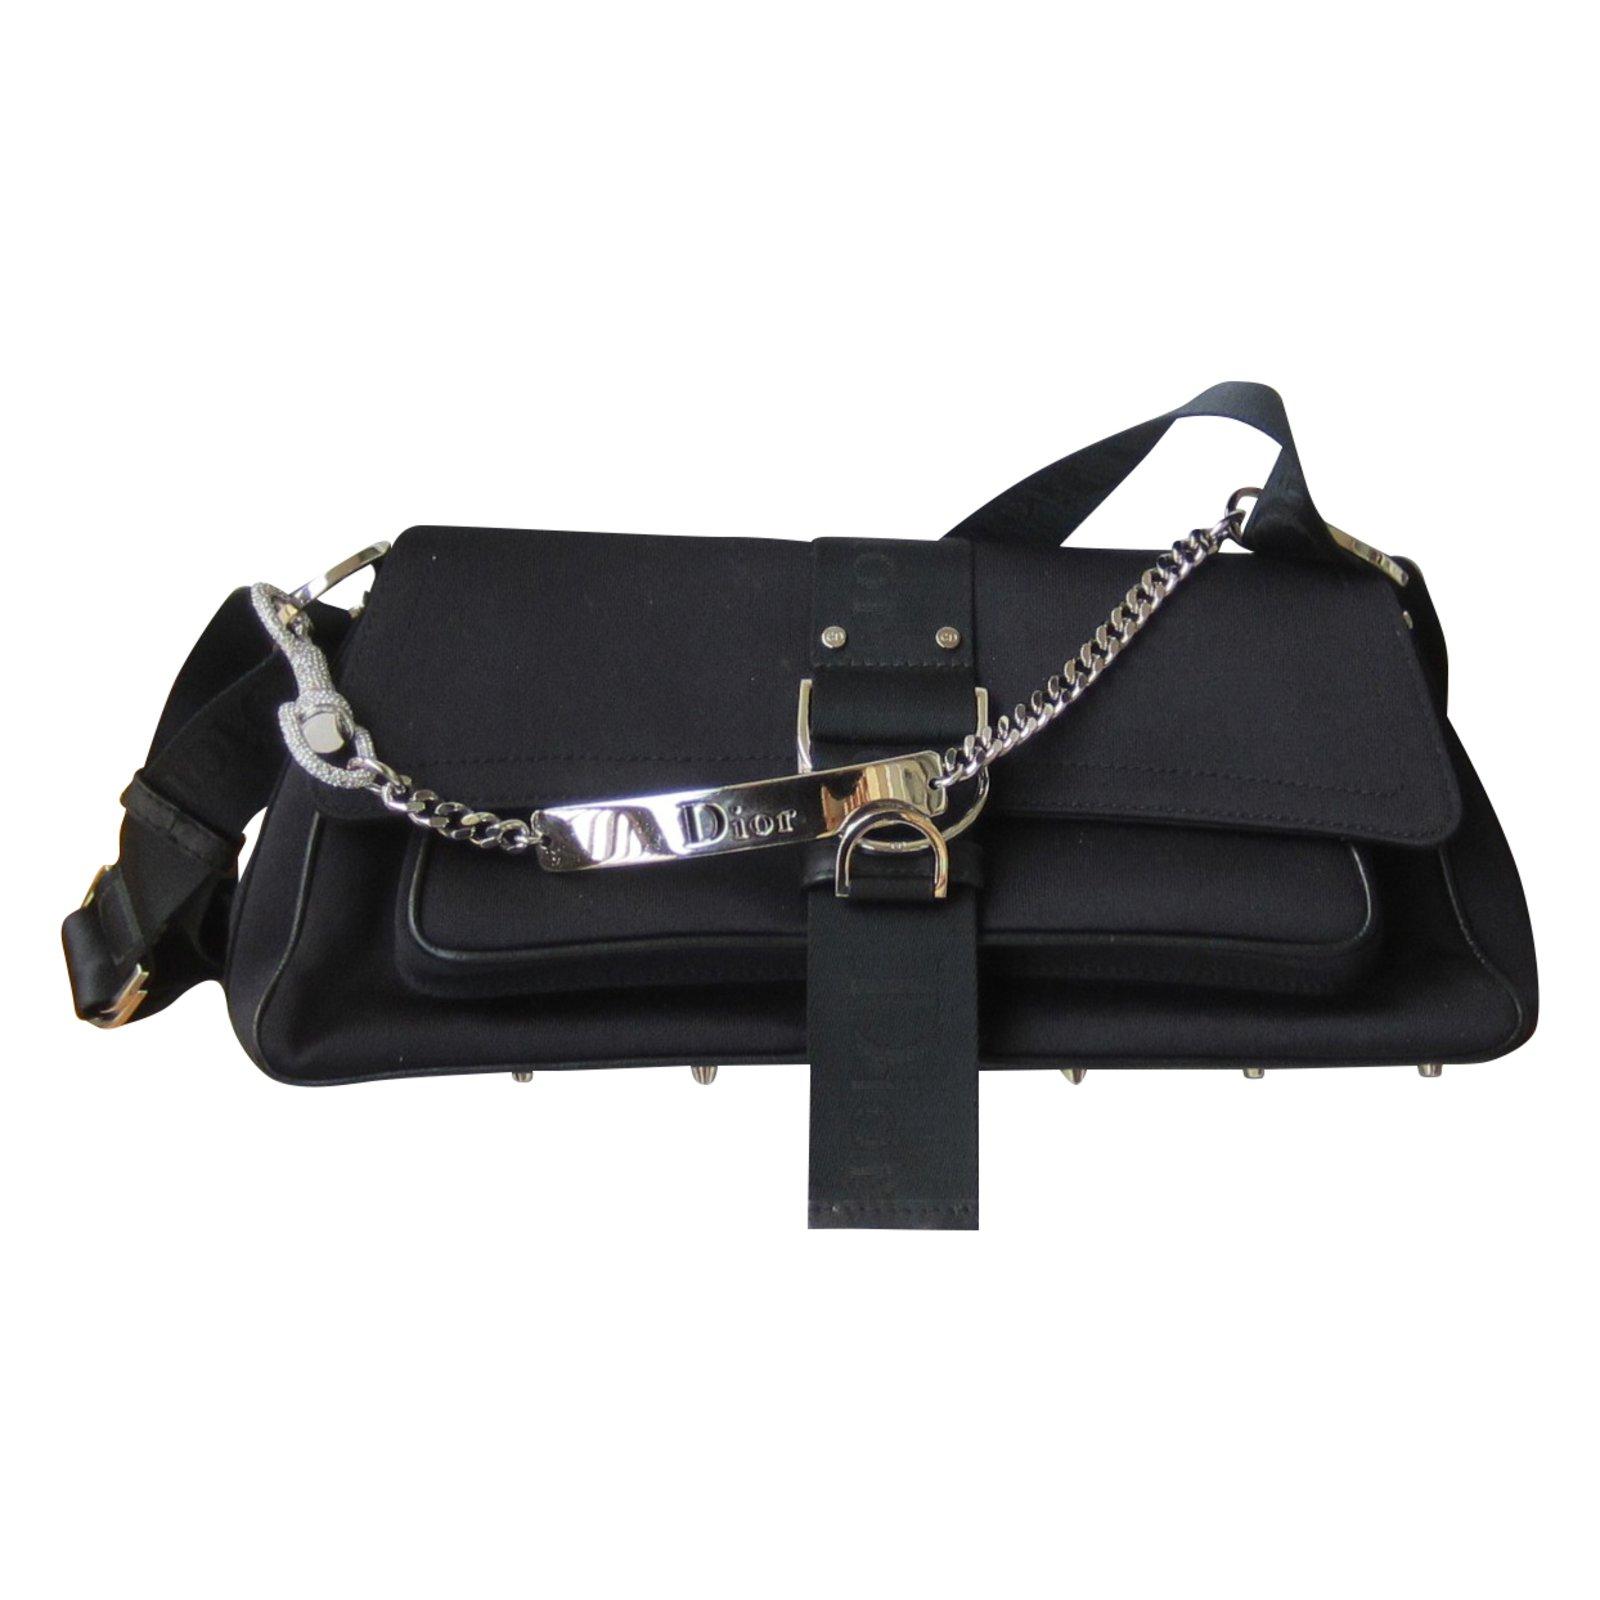 Dior Handbags Leather Black Ref 51519